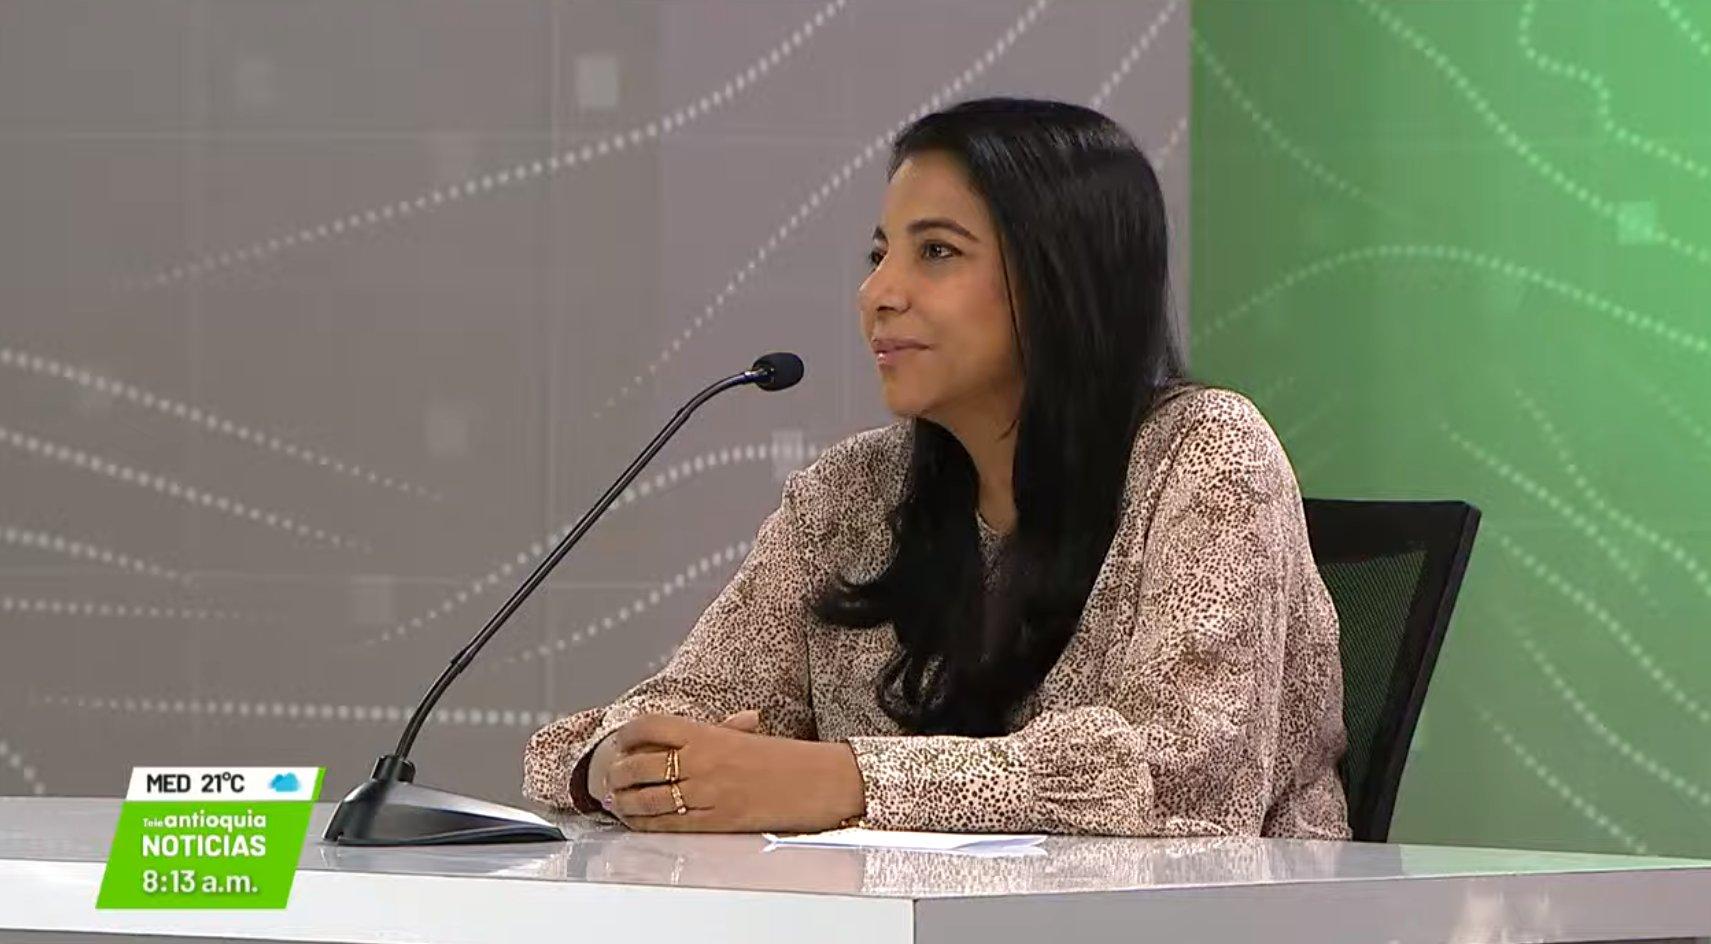 Entrevista con Mabel Astrid Moscote, gerente de Telecaribe